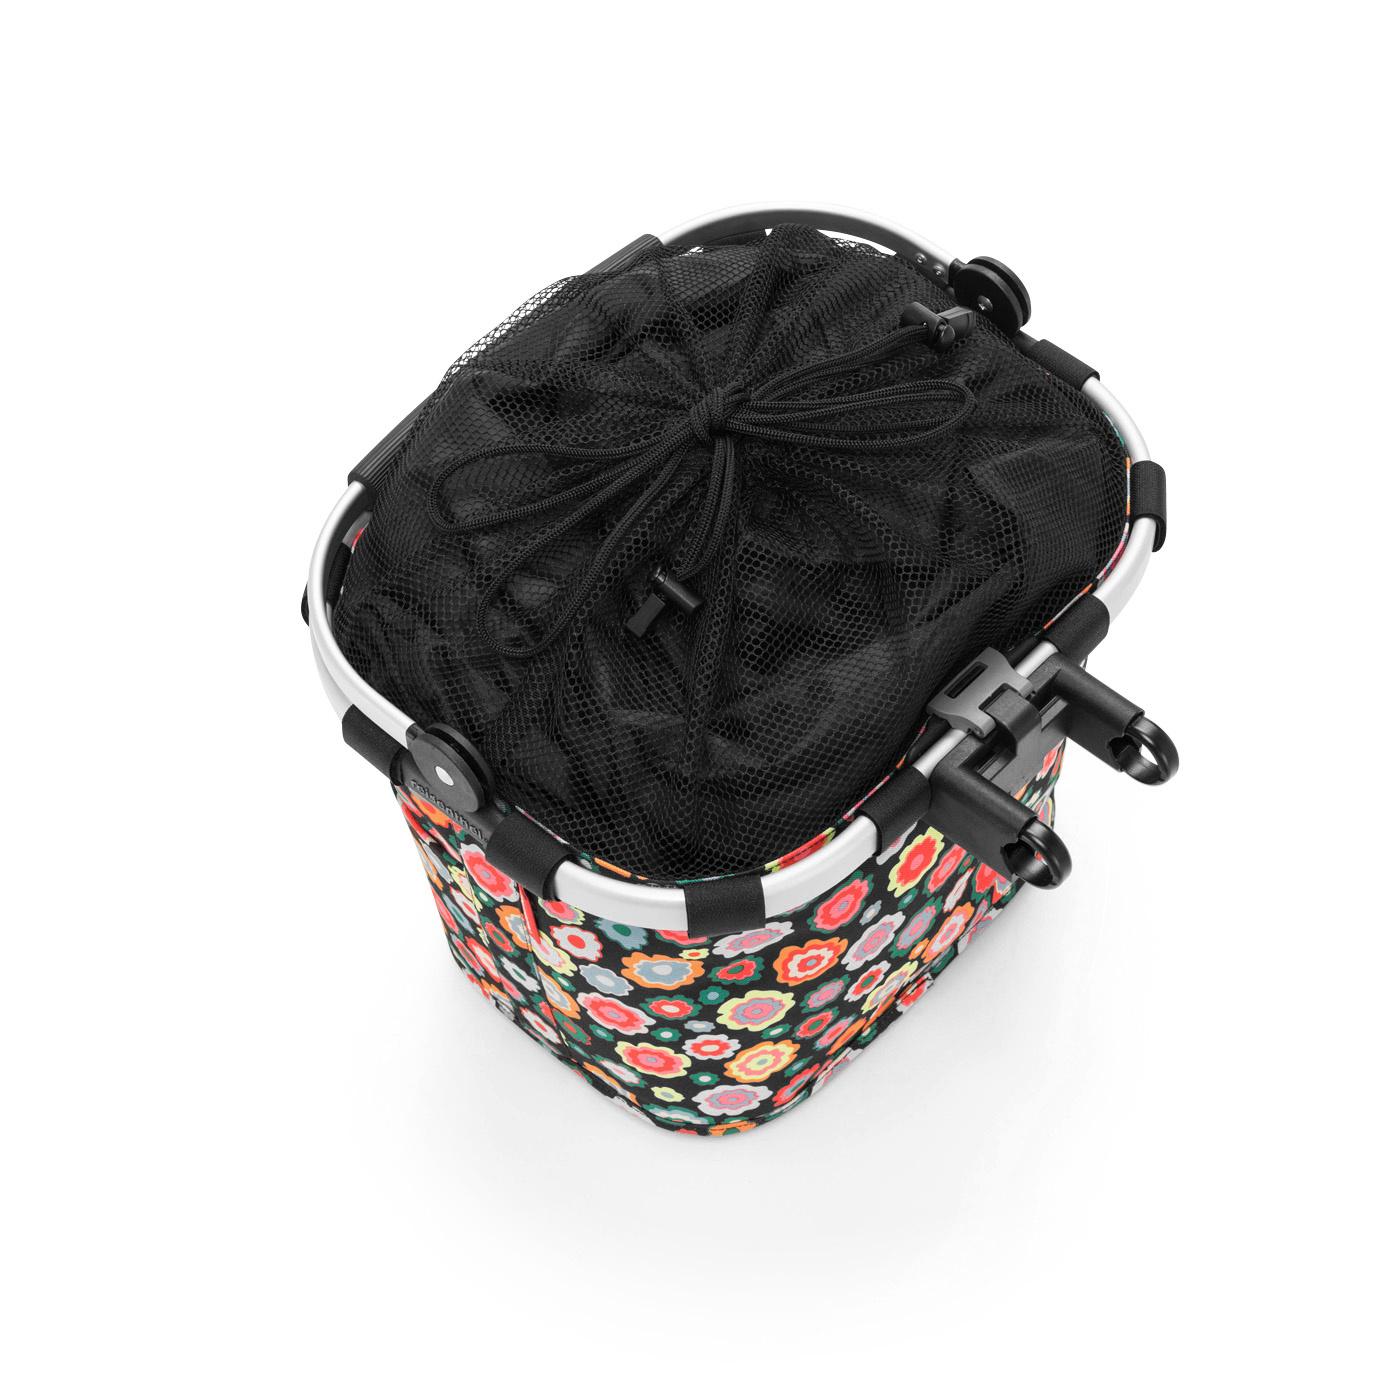 reisenthel bikebasket plus fahrradkorb einkaufskorb korb. Black Bedroom Furniture Sets. Home Design Ideas